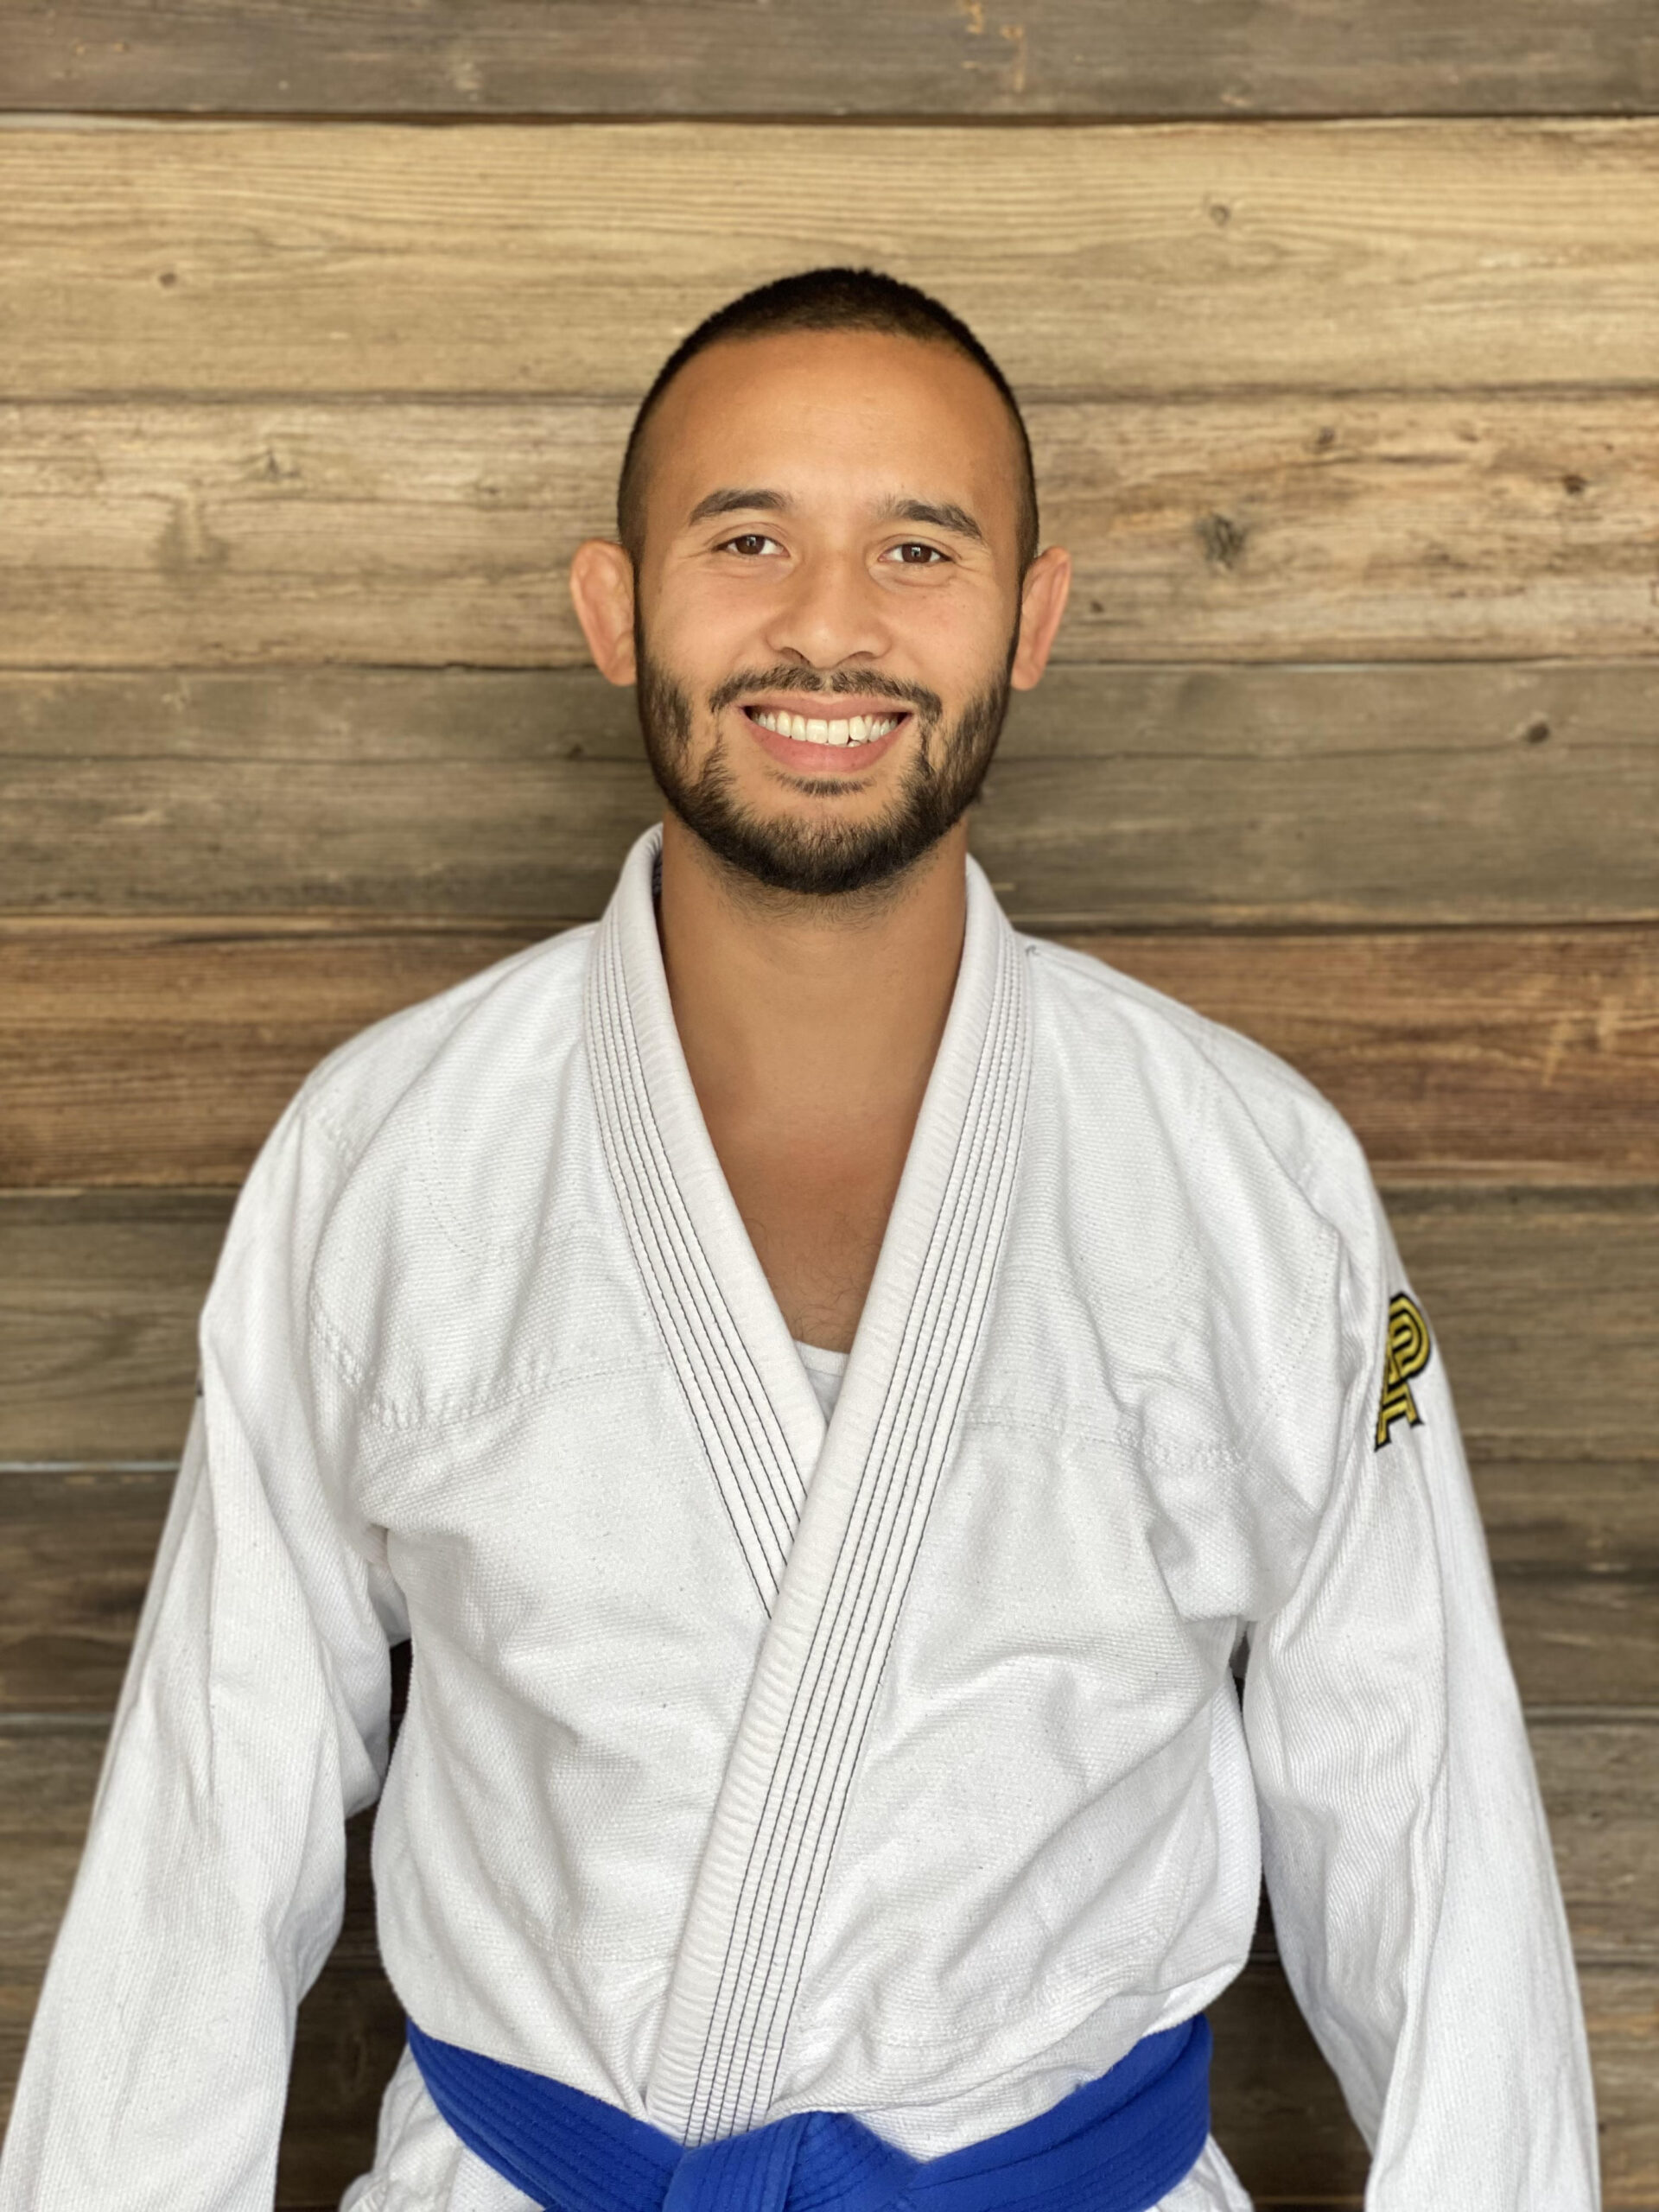 Coach Bill posing in a white Jiu-Jitsu Gi at Prodigy Martial Arts in Blaine, MN